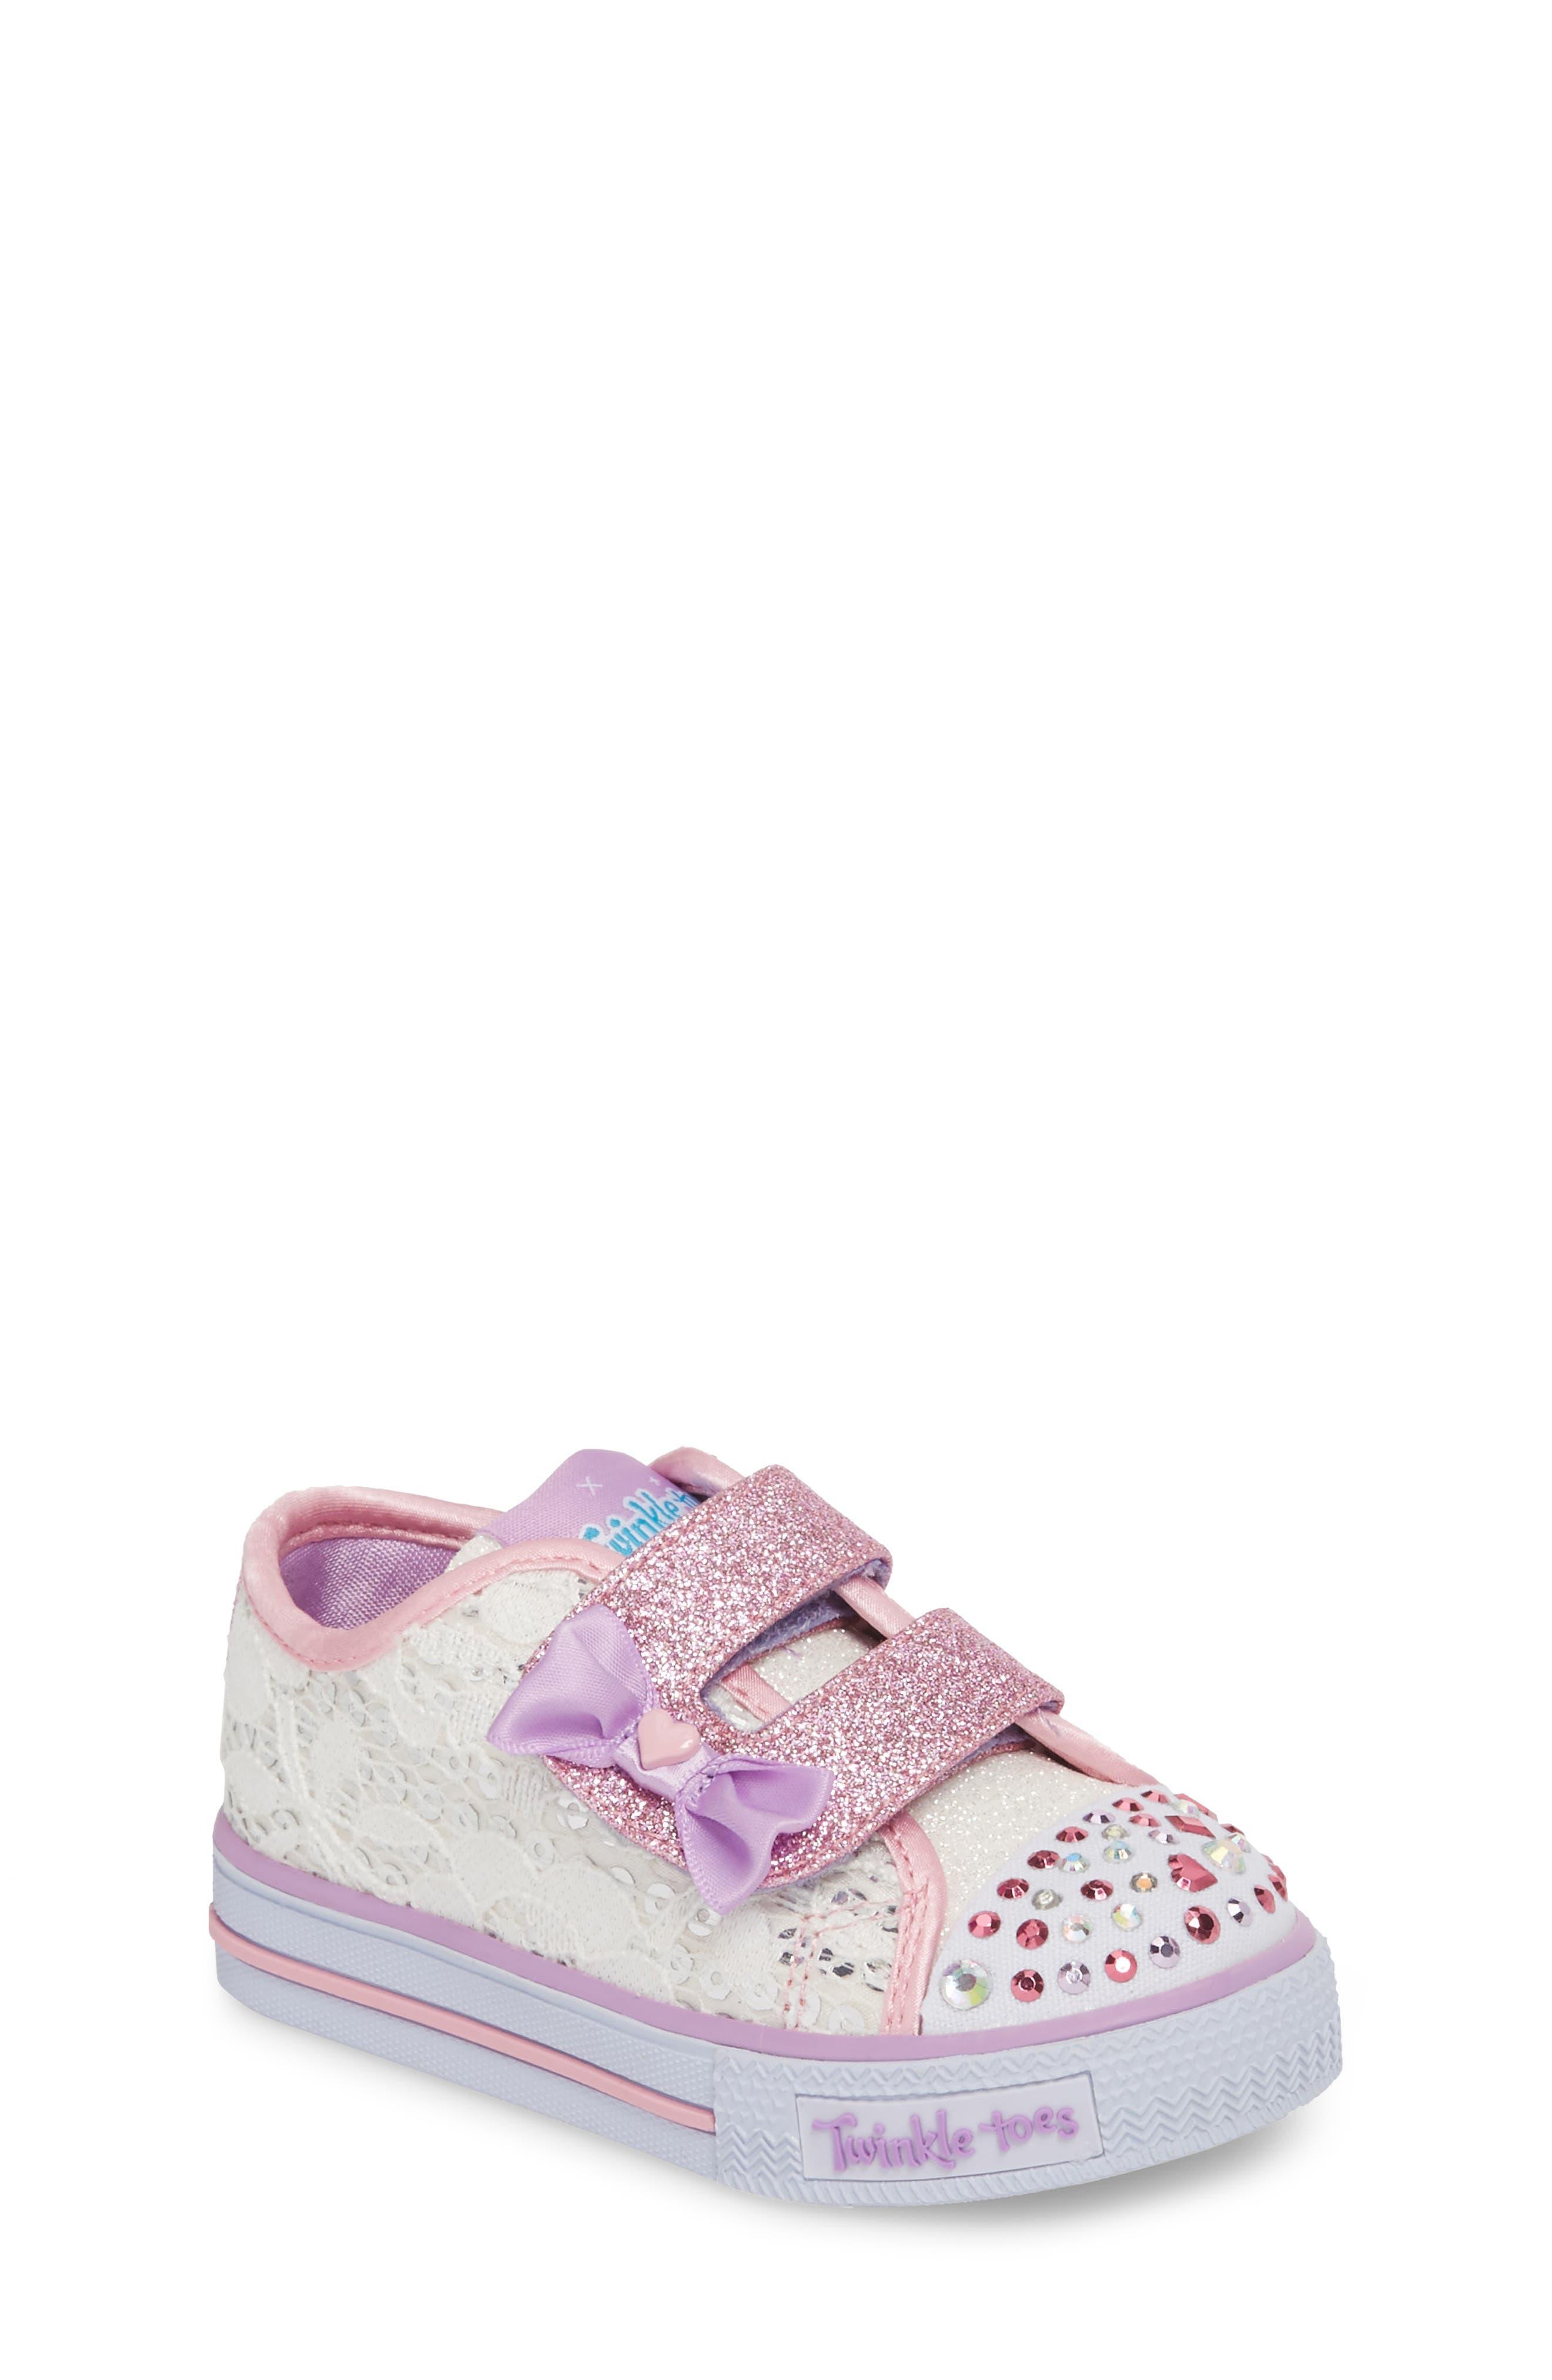 Twinkle Toes Shuffles Light-Up Glitter Sneaker,                             Main thumbnail 1, color,                             100